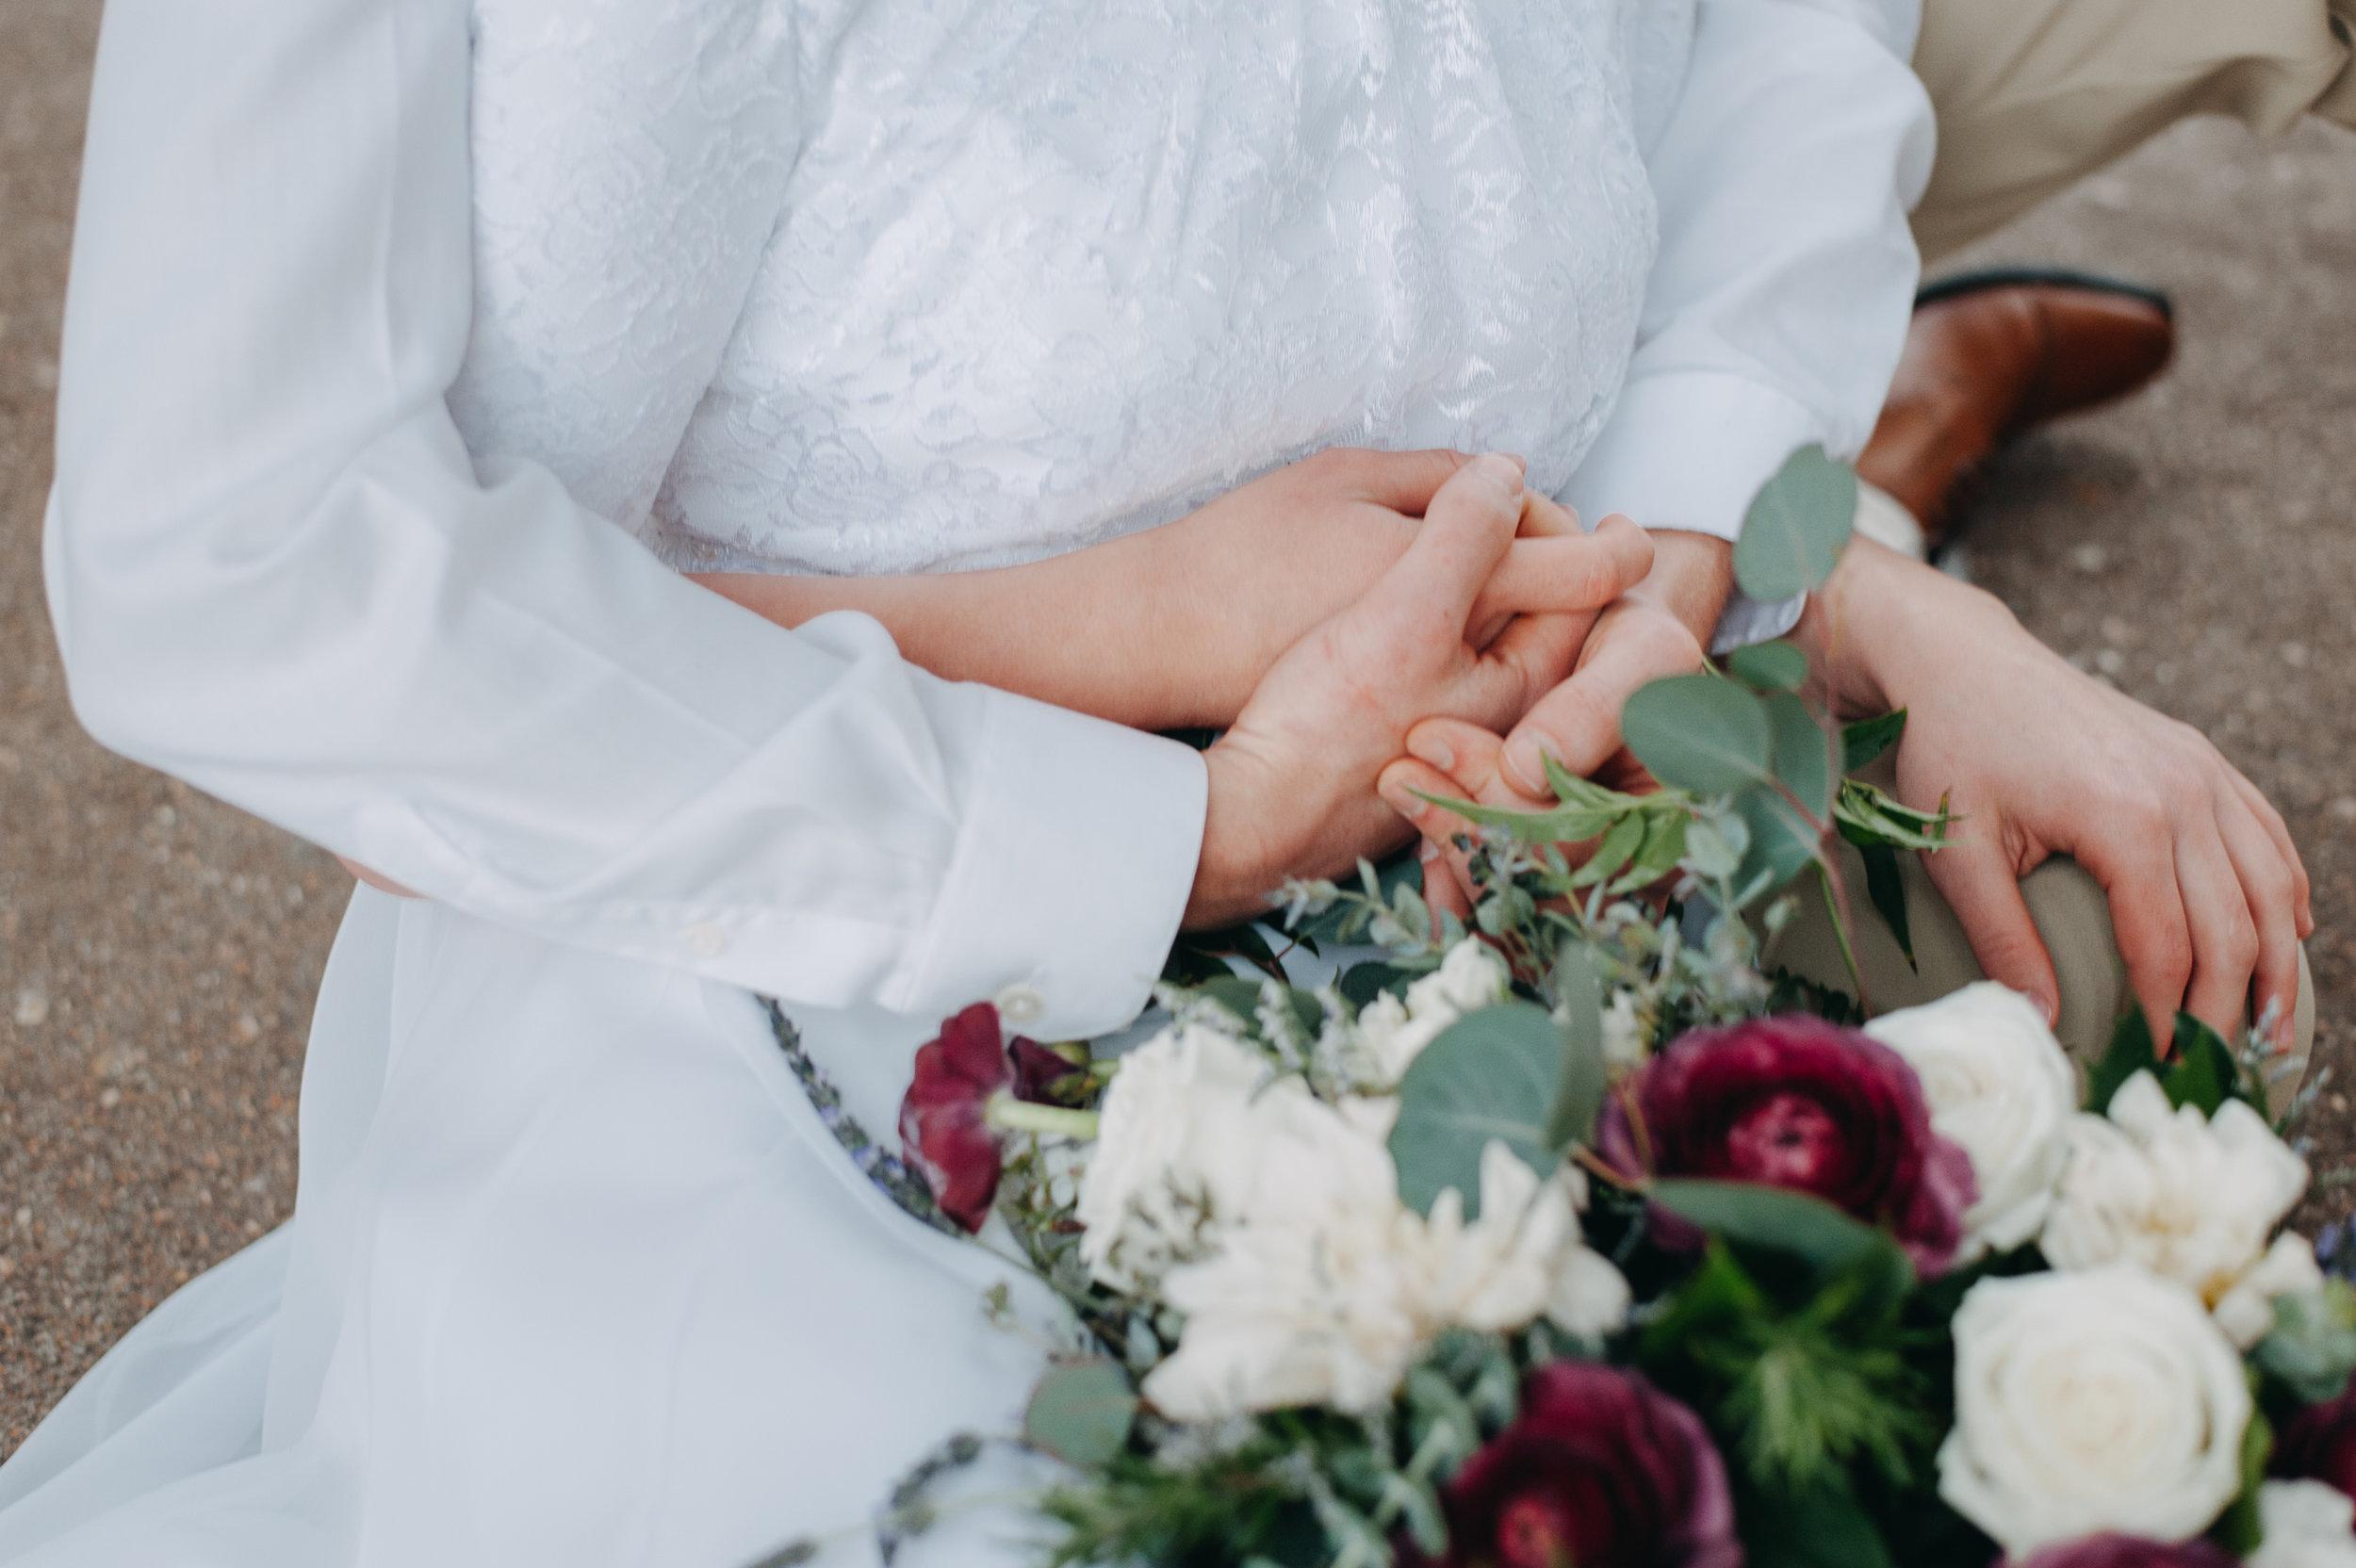 Mennonite Wedding, Mennonite Wedding Ideas, Modest Wedding Dress, Mennonite Wedding Photography, Classic Wedding, Christian Wedding Ideas, Missouri Country Wedding, Northeast Missouri Wedding, DIY Wedding Ideas, Natural Photography, Lifestyle Engagement Photography, Engagement Poses,